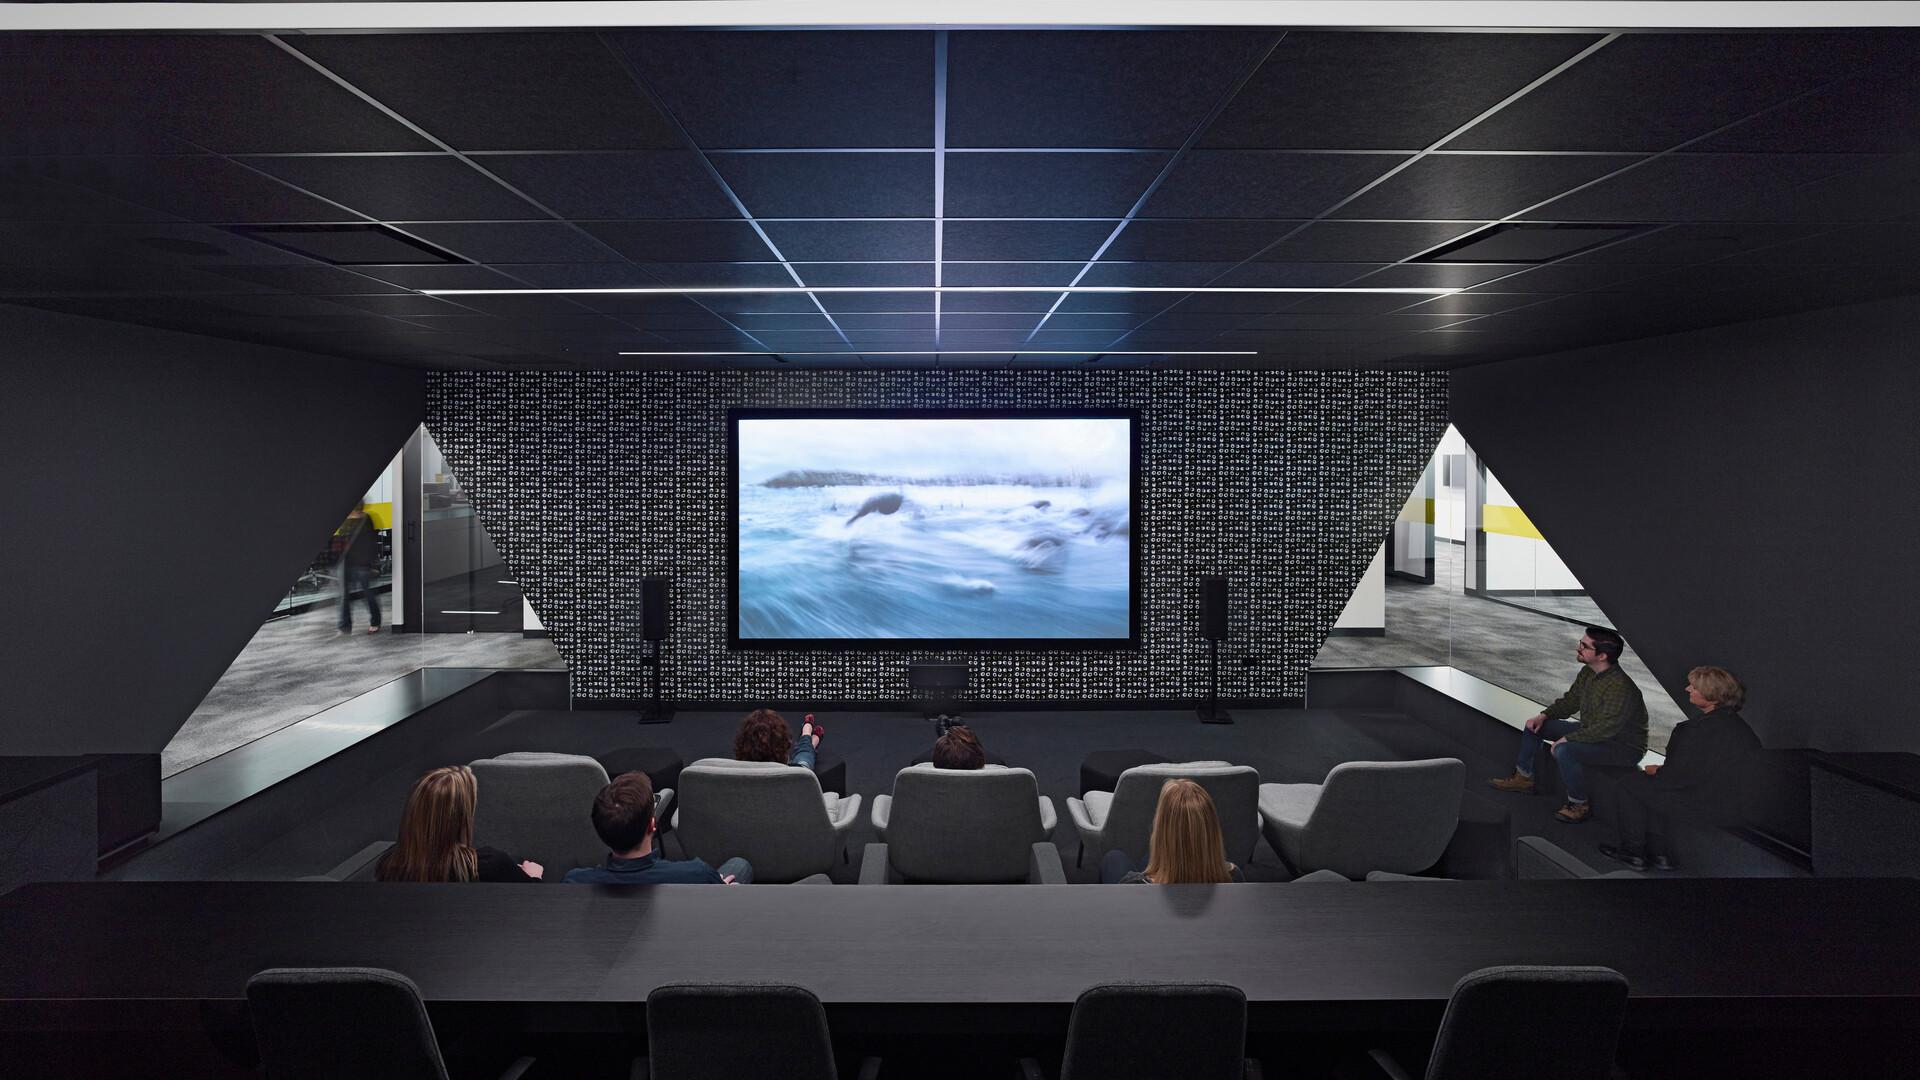 NA, MPI Media Group, office, conference room, media room, 1200, suspension system, grid, Cinema Black, SQ, 2x2, lay in